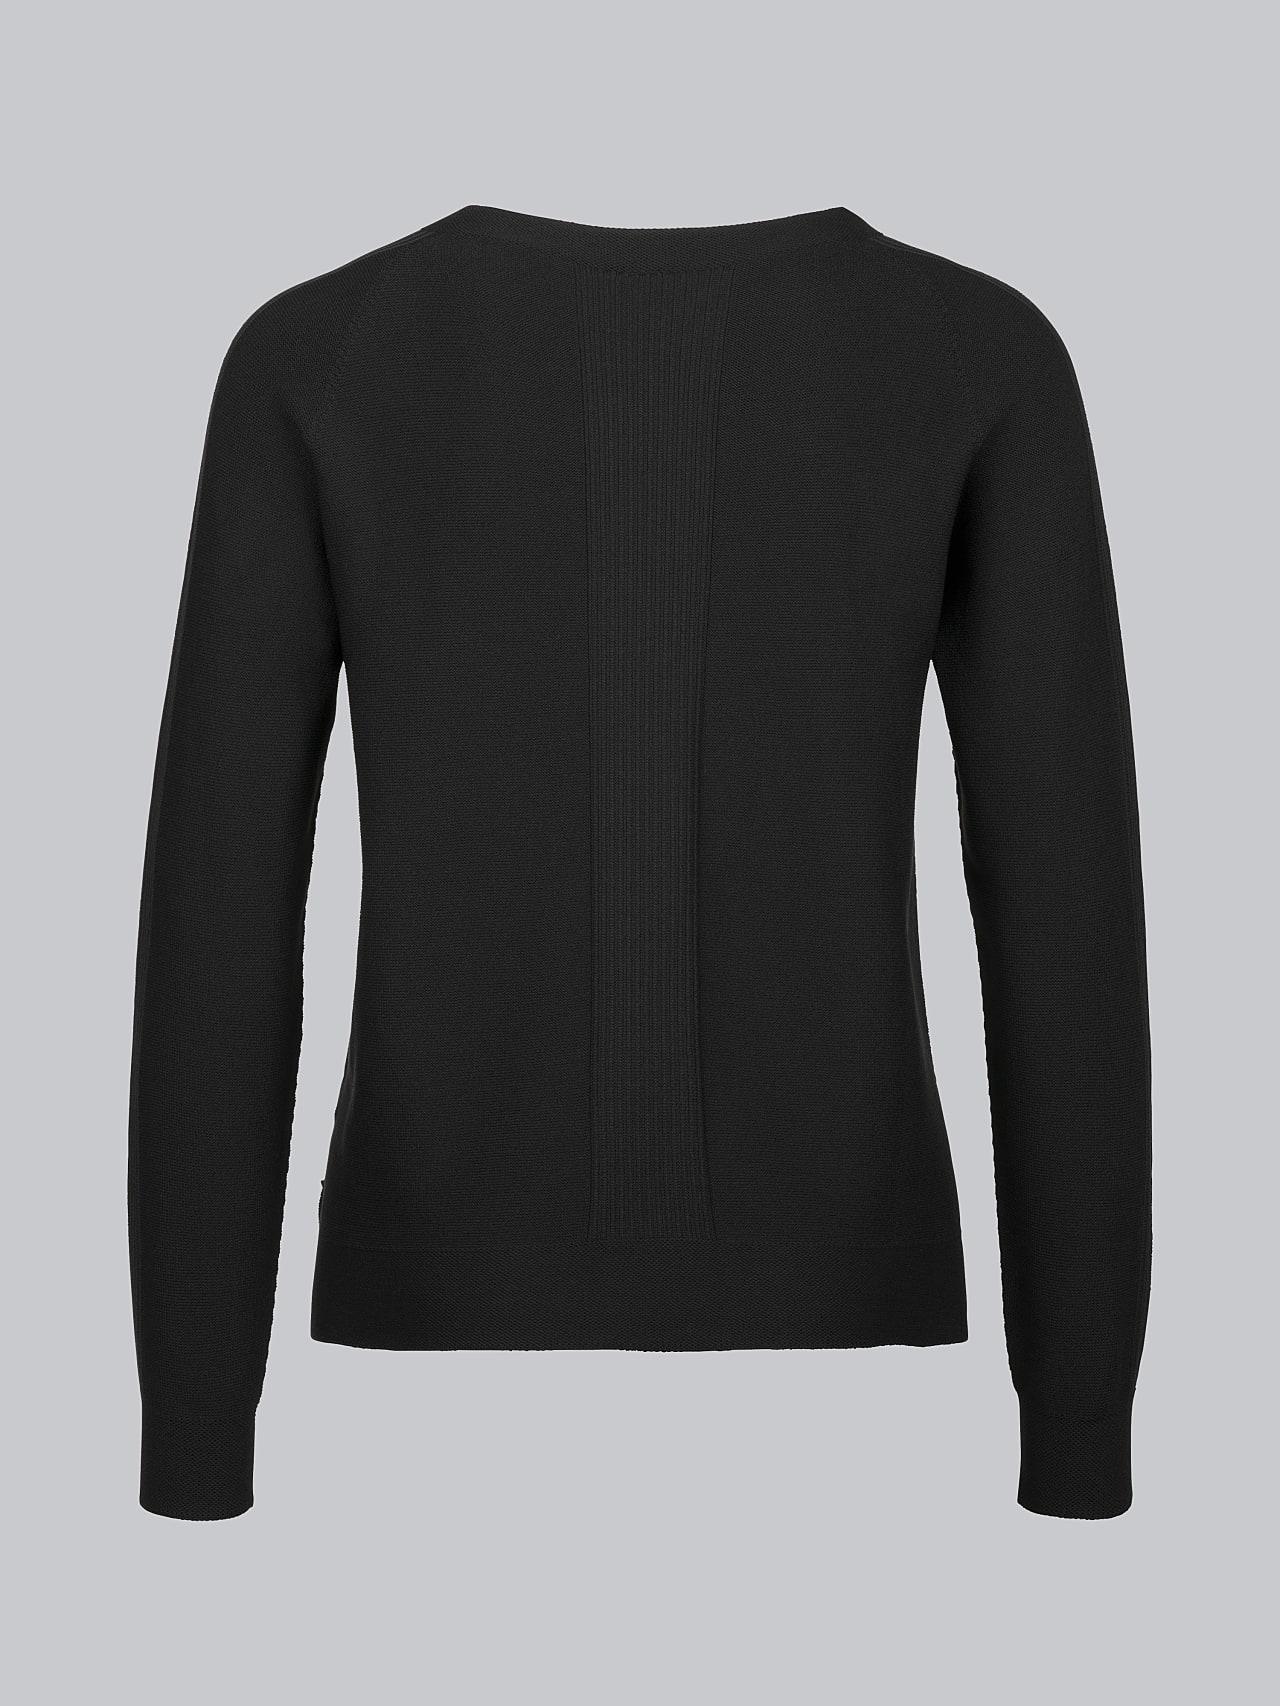 FINTEW V2.Y4.01 3D Performance Knit Sweater black Left Alpha Tauri